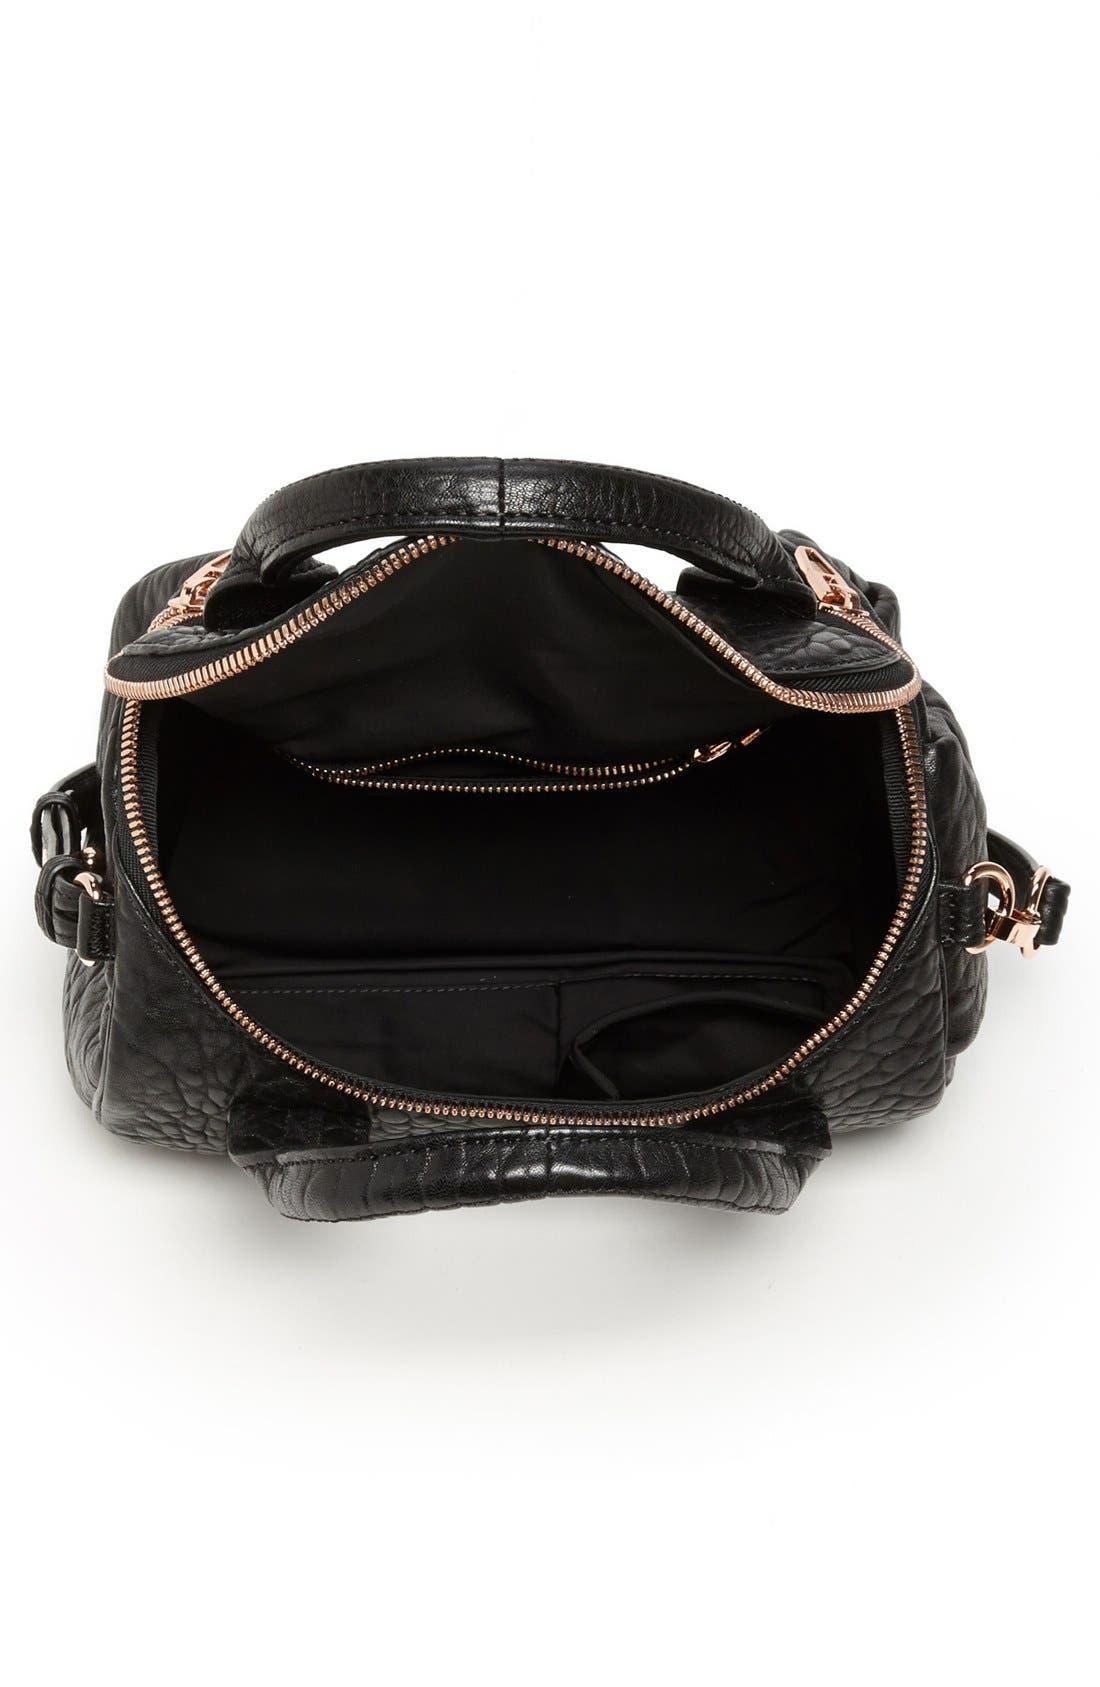 ALEXANDER WANG, 'Rockie - Rose Gold' Leather Crossbody Satchel, Alternate thumbnail 3, color, BLACK ROSE GLD HRDWRE